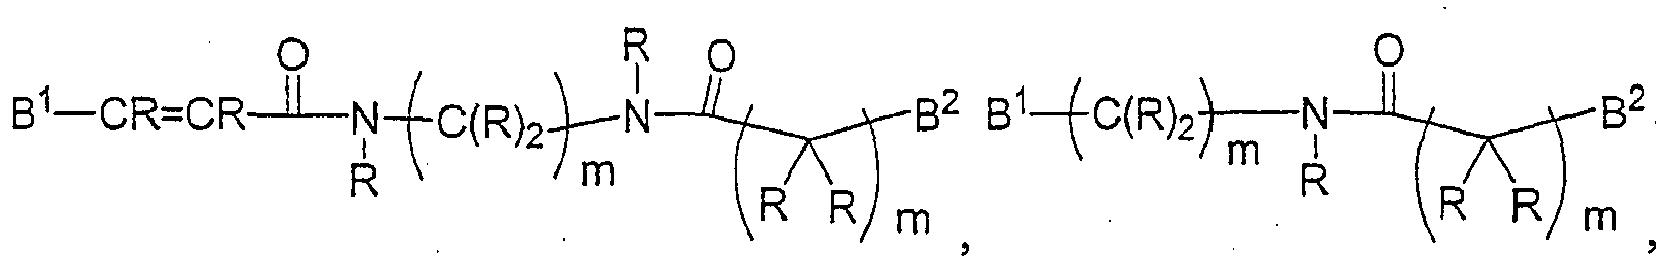 Figure imgb0259